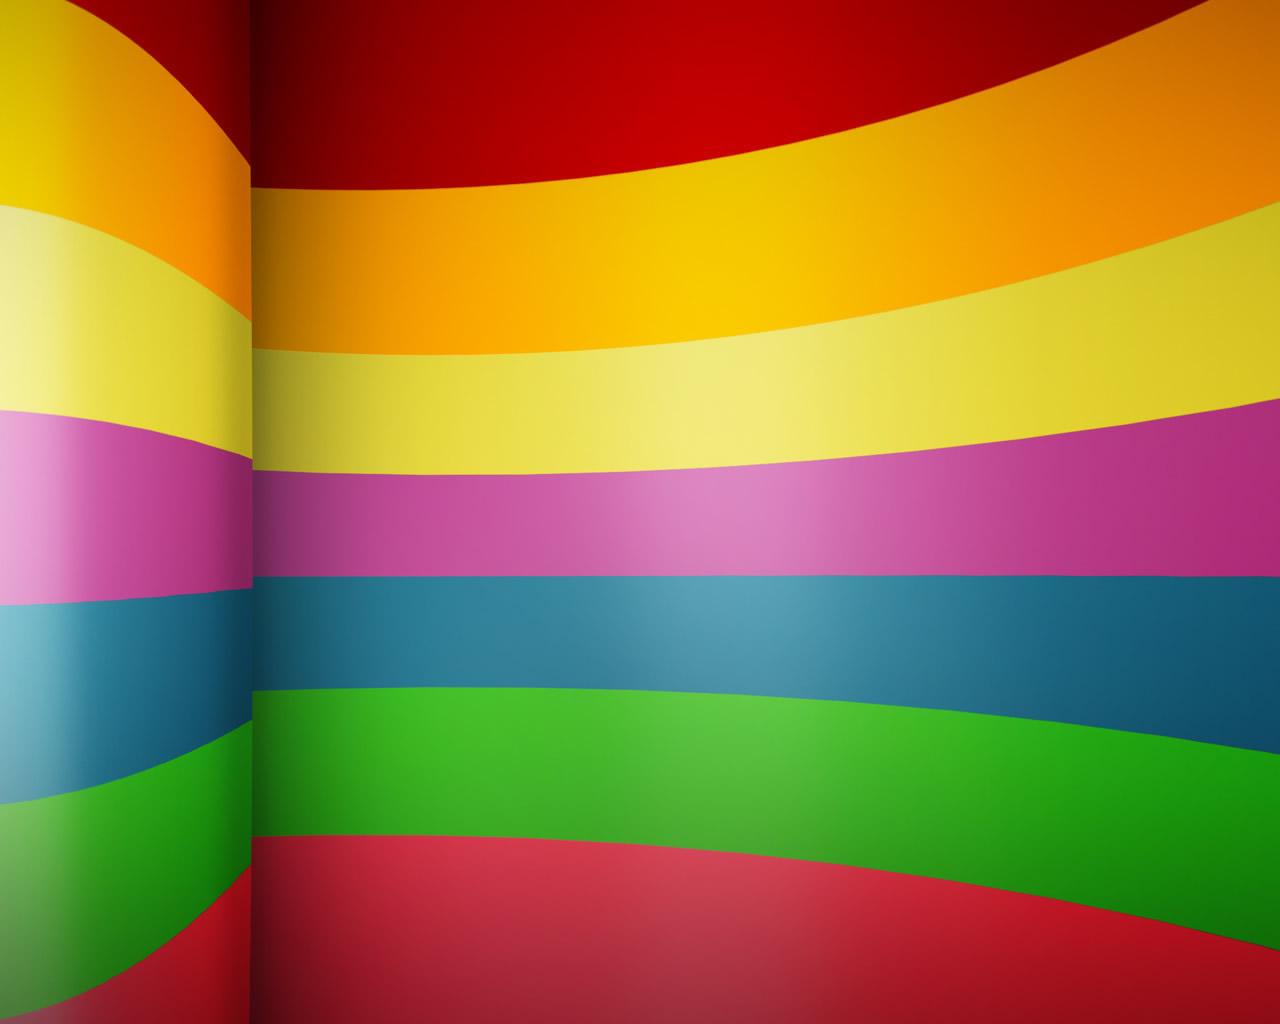 Fondo De Lineas De Colores Para Utilizar Como Wallpaper